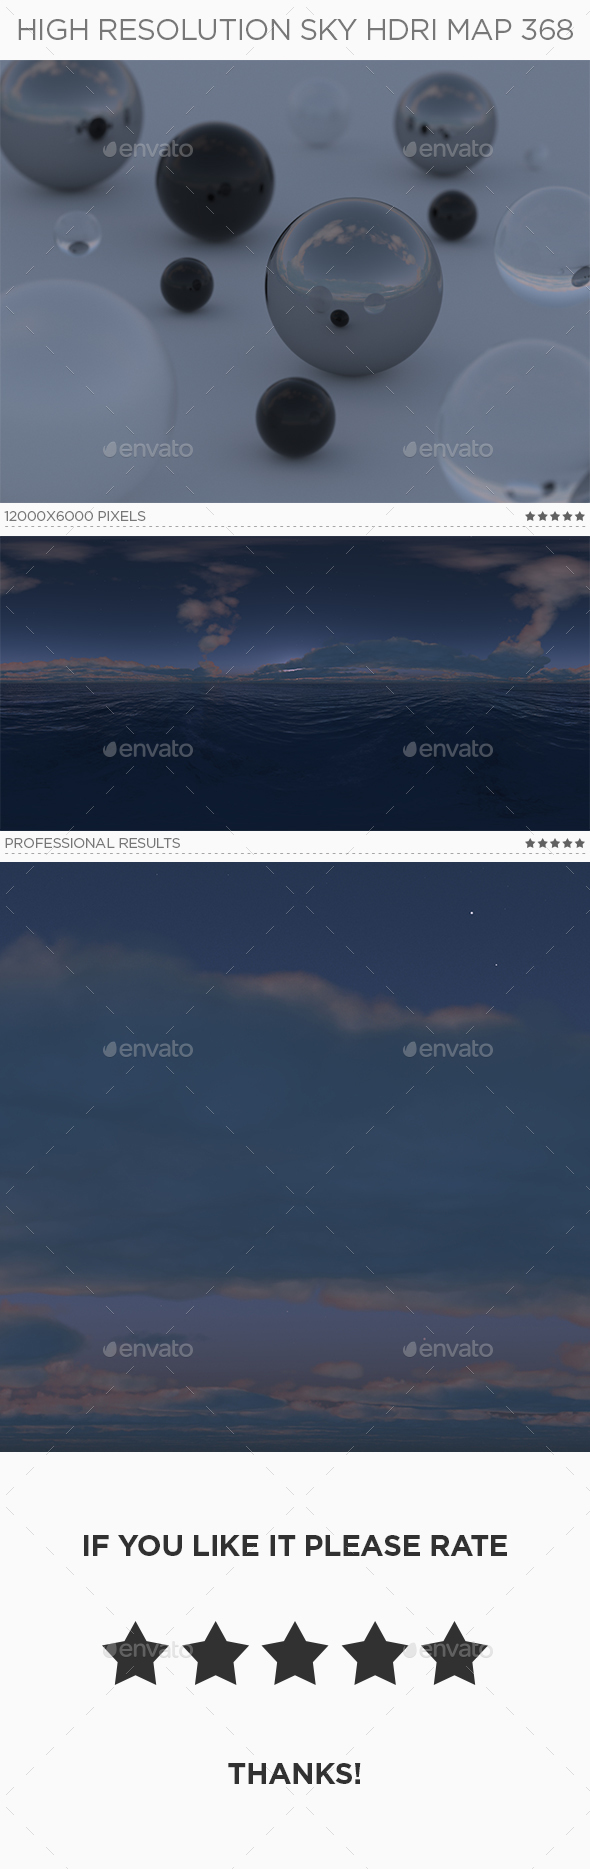 High Resolution Sky HDRi Map 368 - 3DOcean Item for Sale